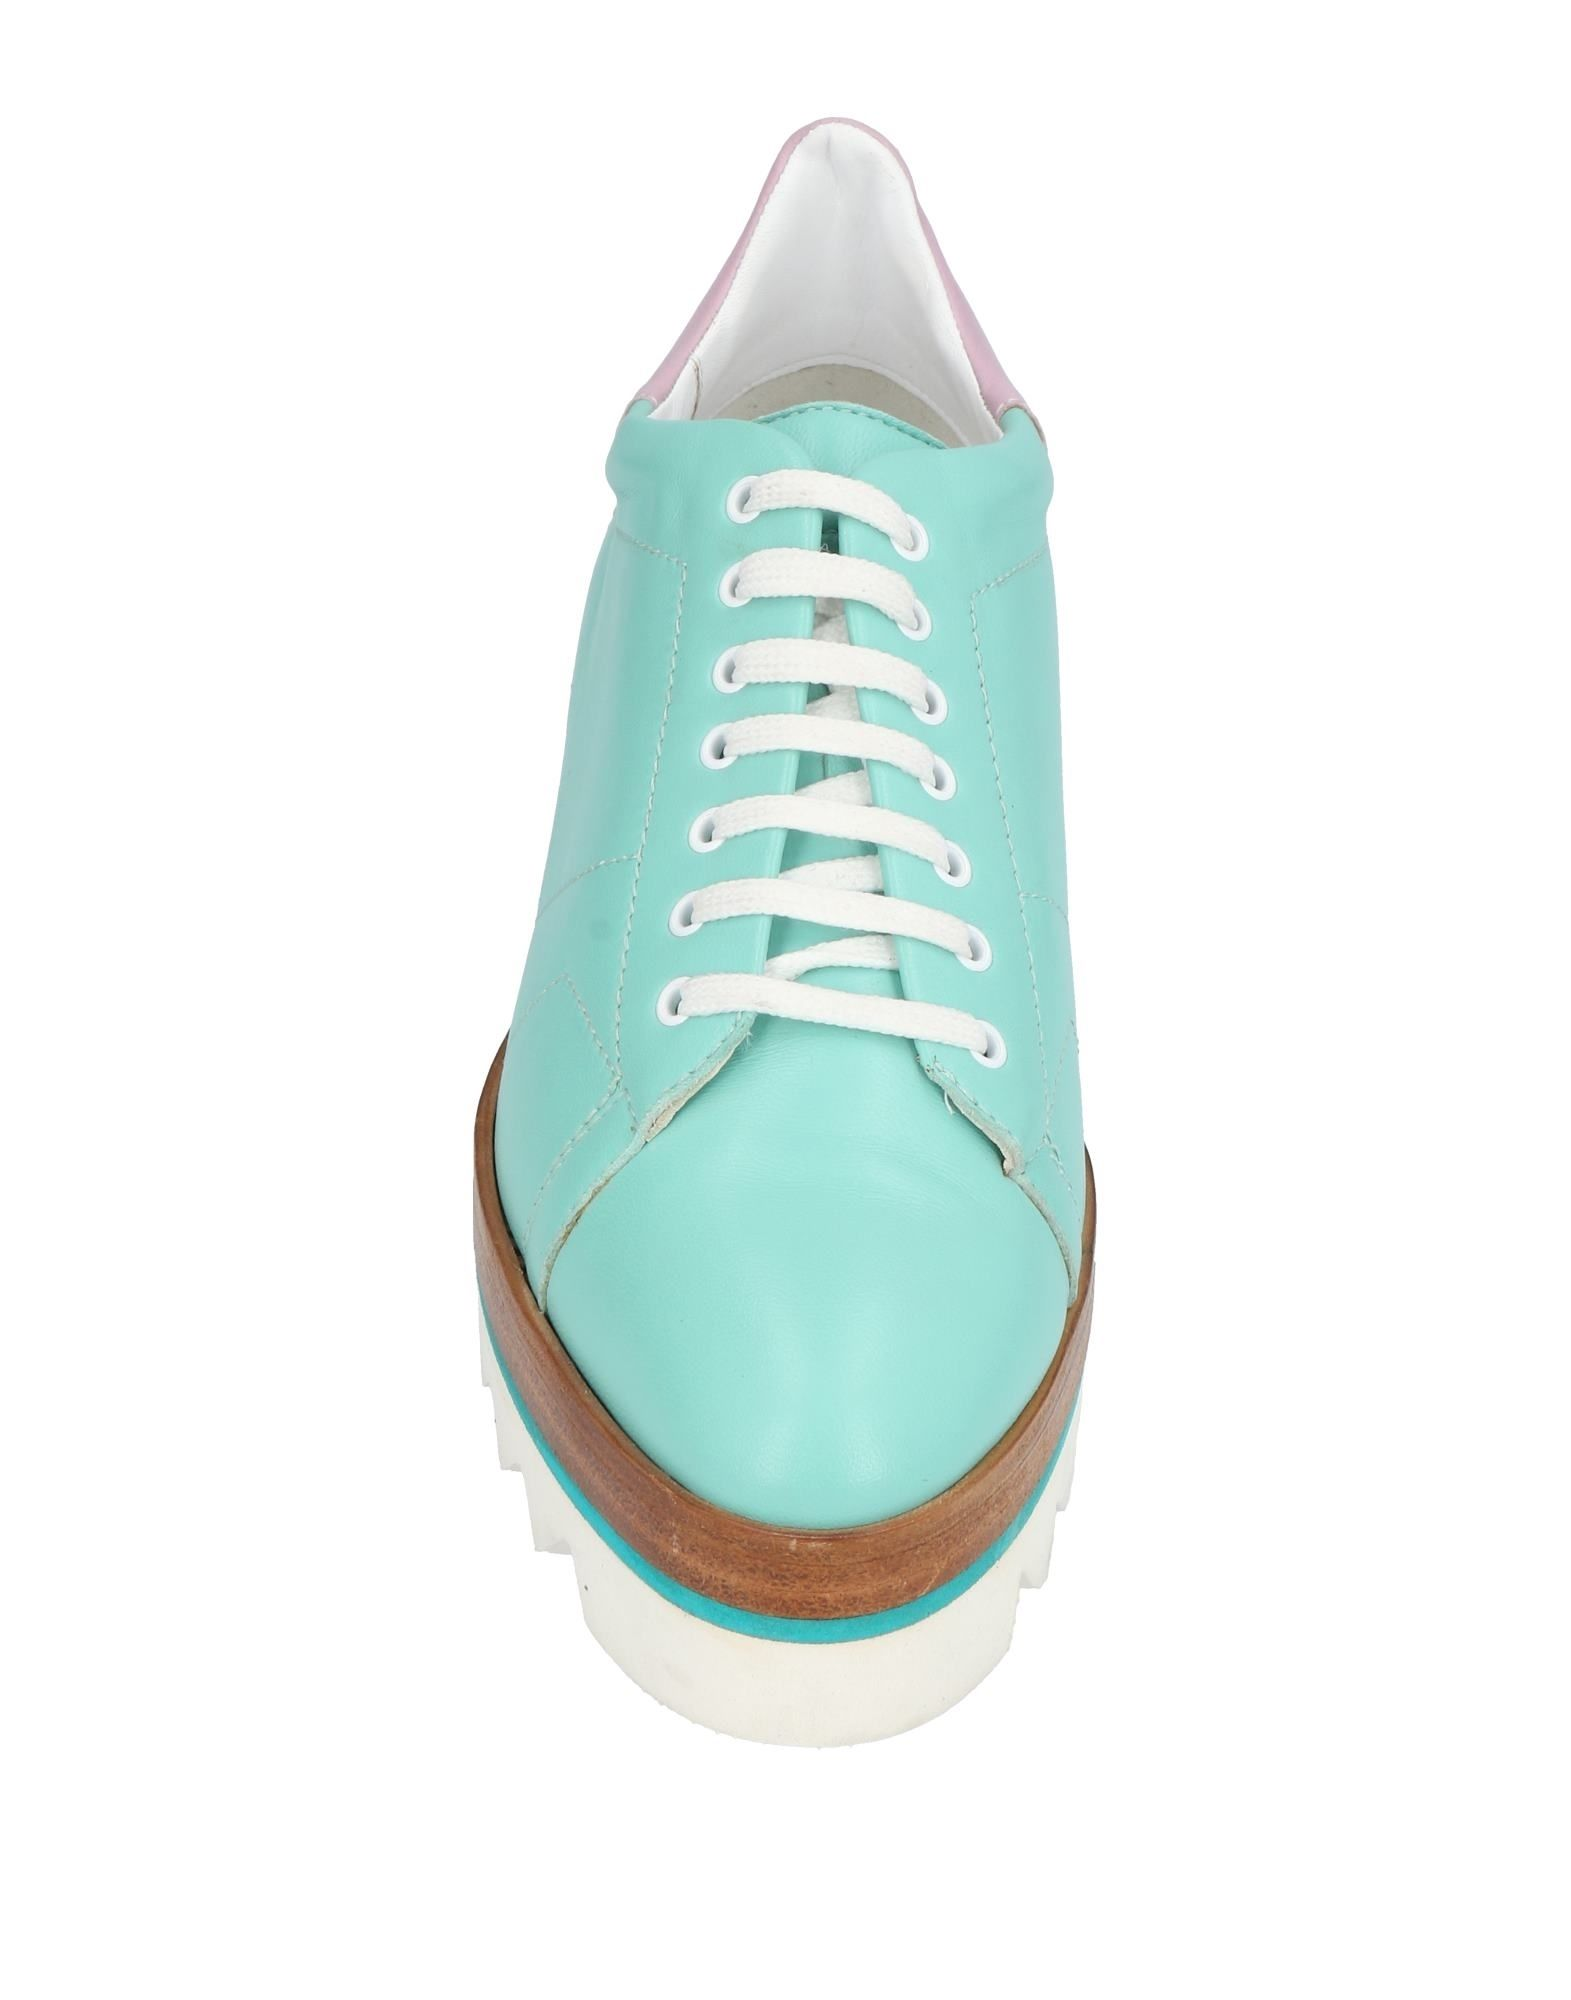 CHAUSSURES - Chaussures à lacetsAldo Castagna yPBwoRkftp